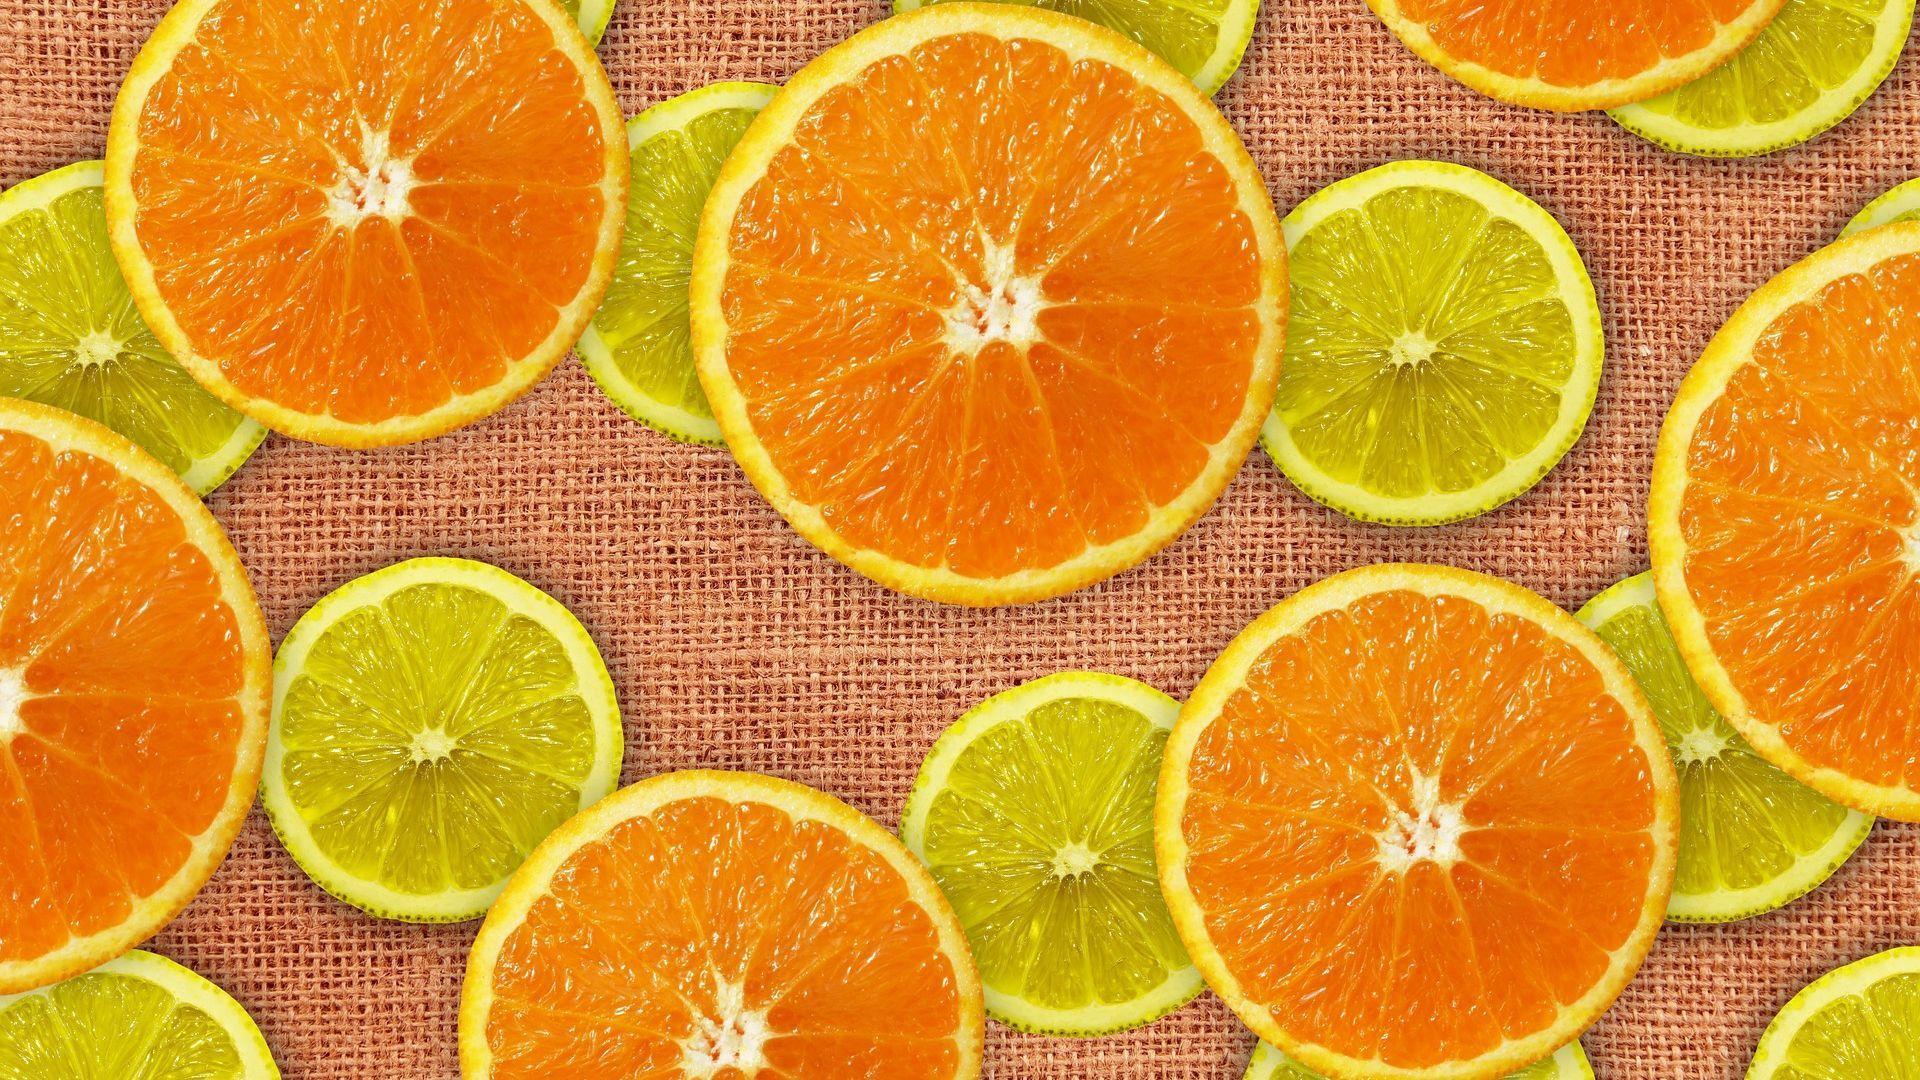 Lemons Wallpapers Top Free Lemons Backgrounds Wallpaperaccess